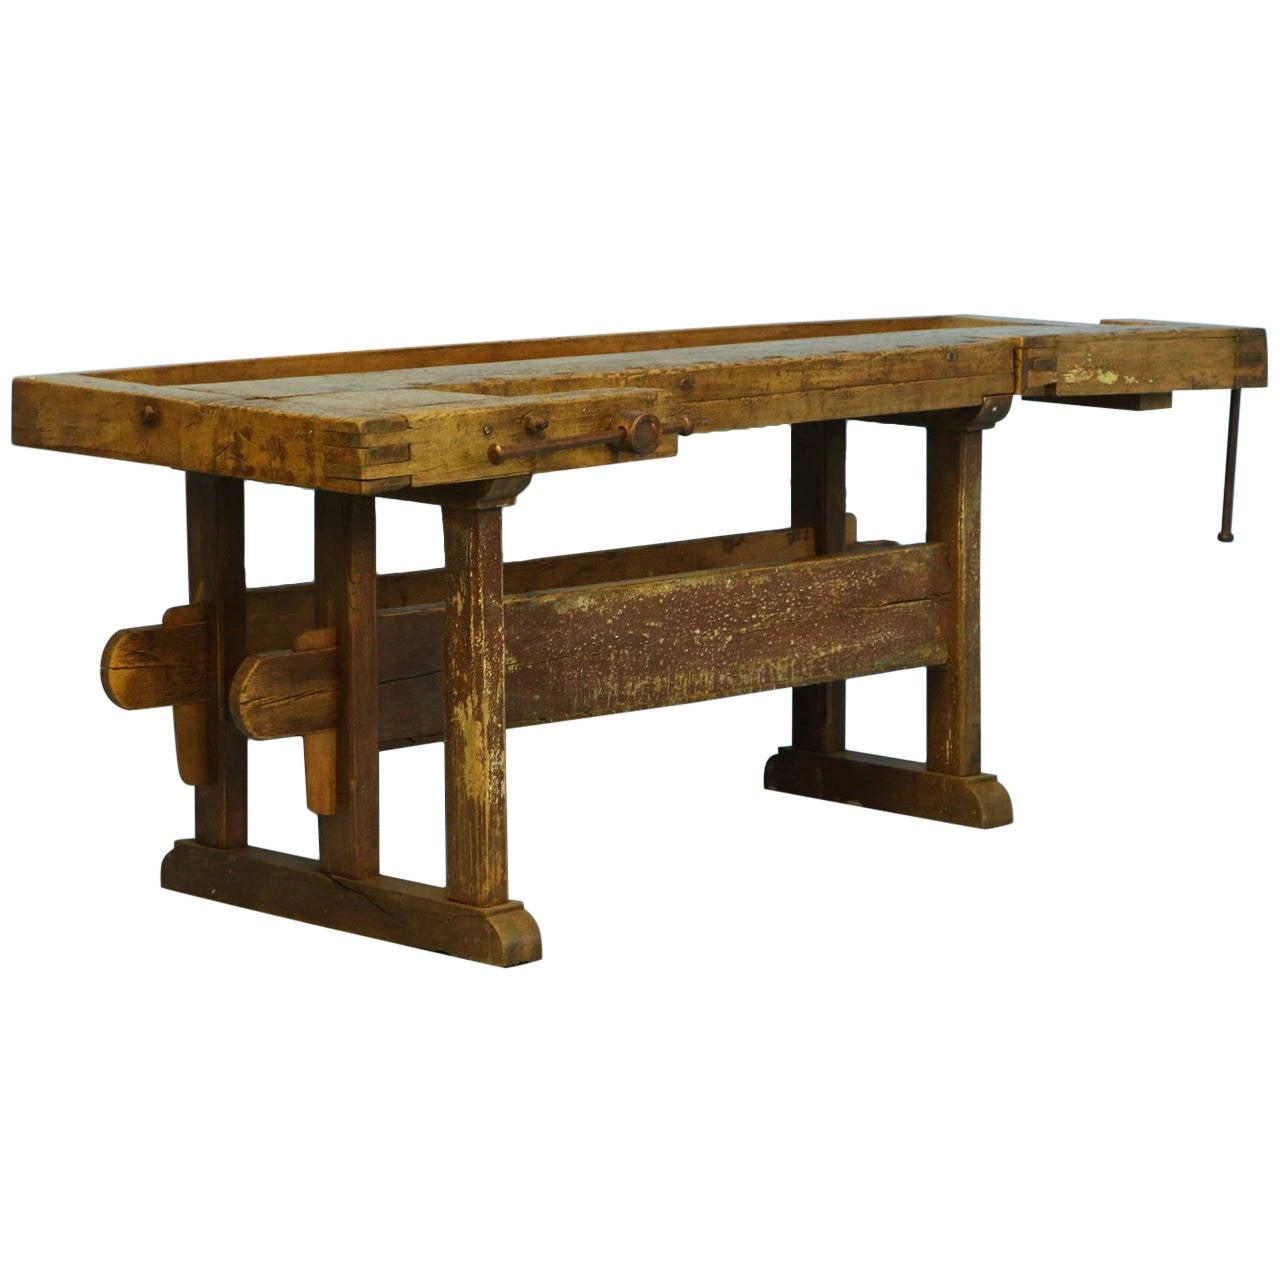 Amazing Antique Carpenteru0027s Workbench, Unusual Console Table, Circa 1860 1880 1 Photo Gallery